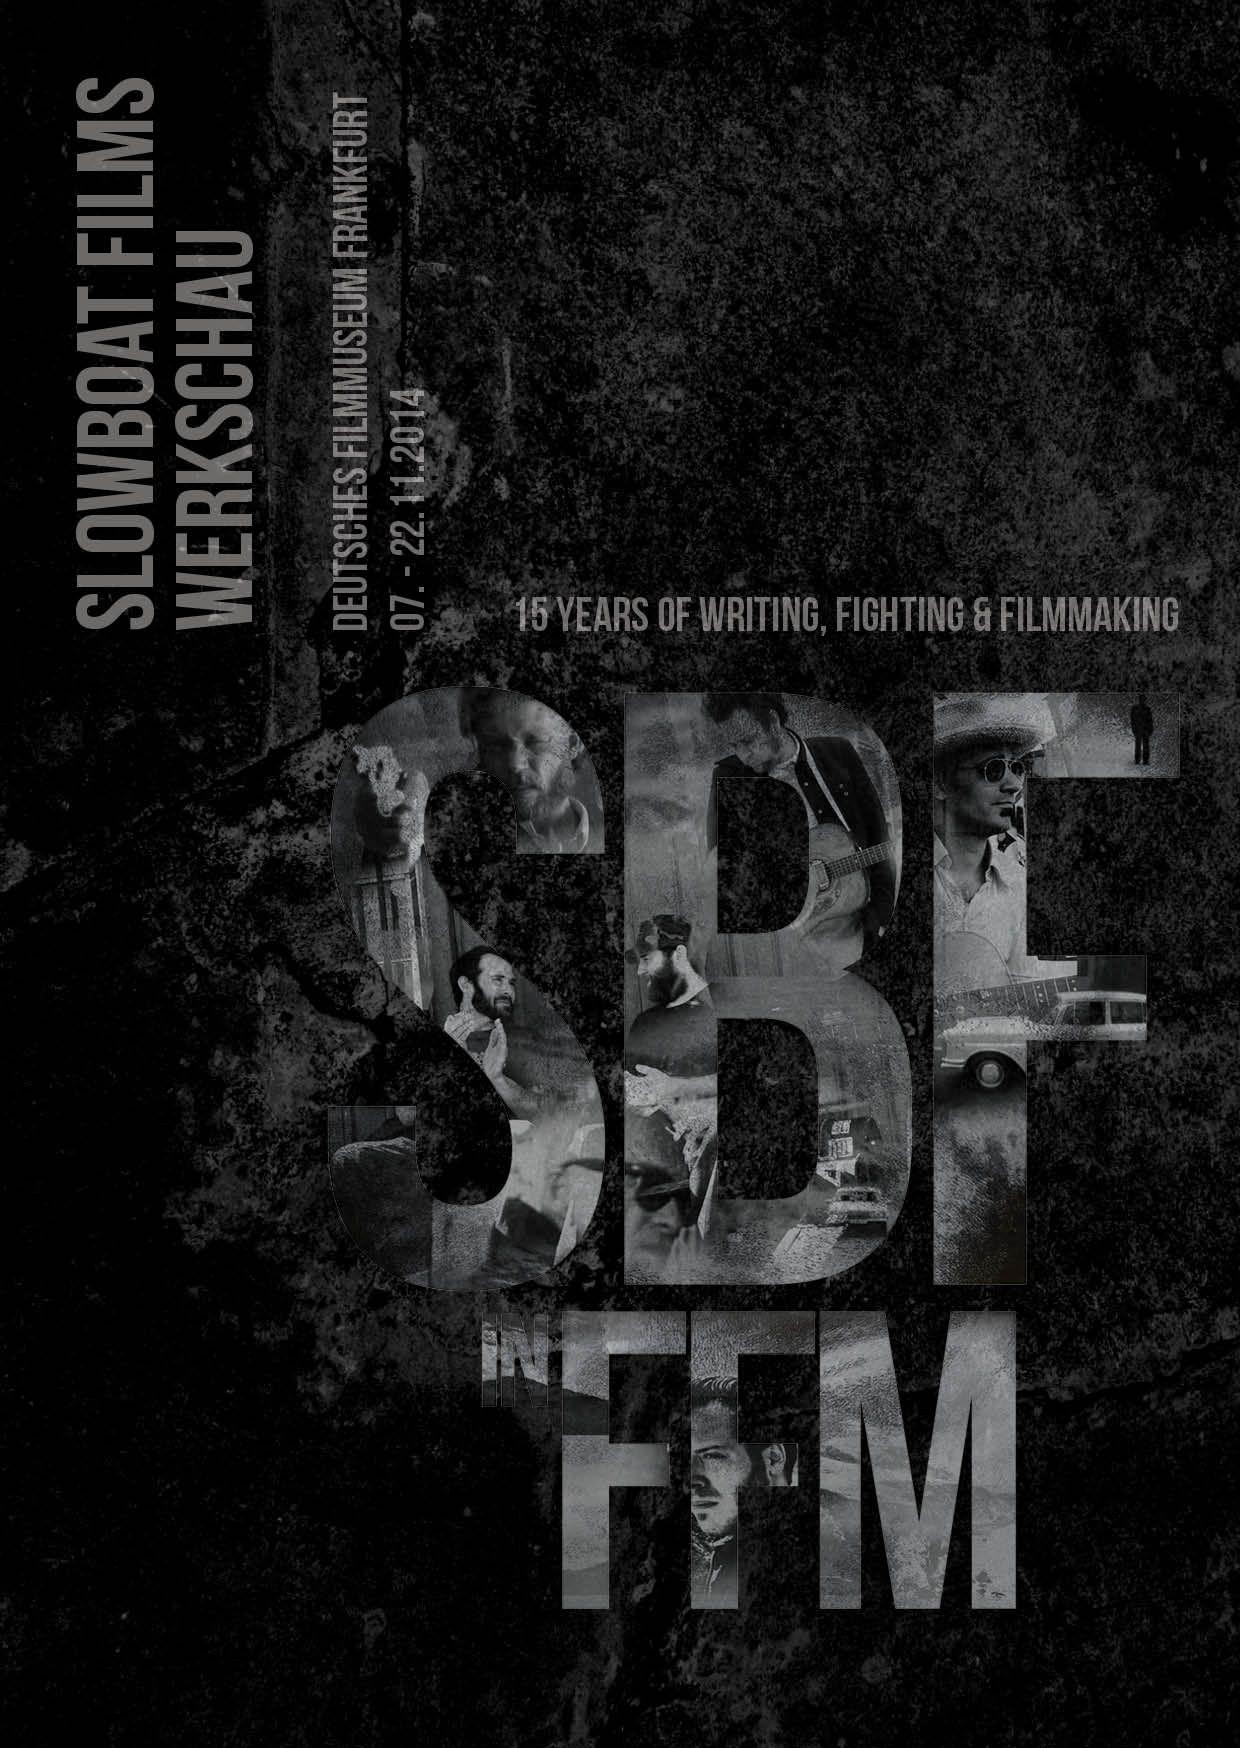 SLOWBOAT FILMS RETROSPECTIVE GERMAN FILMMUSEUM Nov. 2014